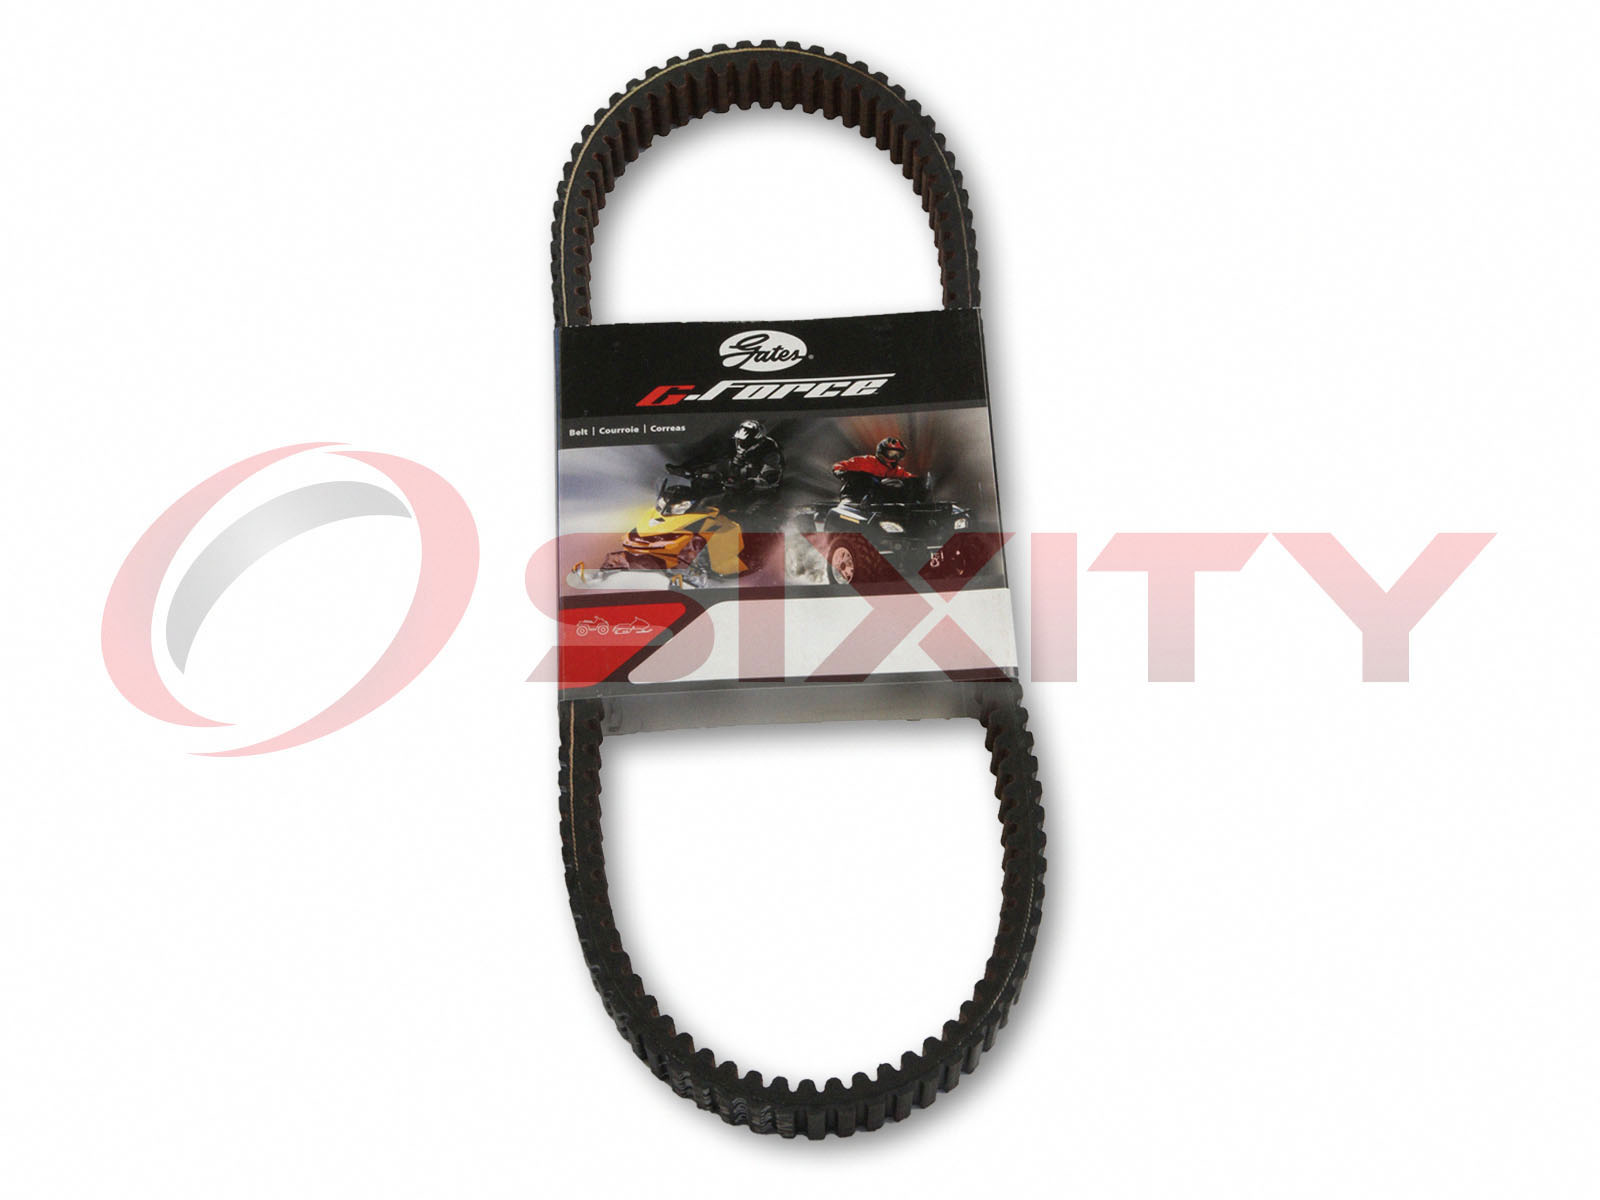 Trim etc- Qty.25- #090 Grille Chrysler Nylon Trim Screw Nuts- Headlight Bezel